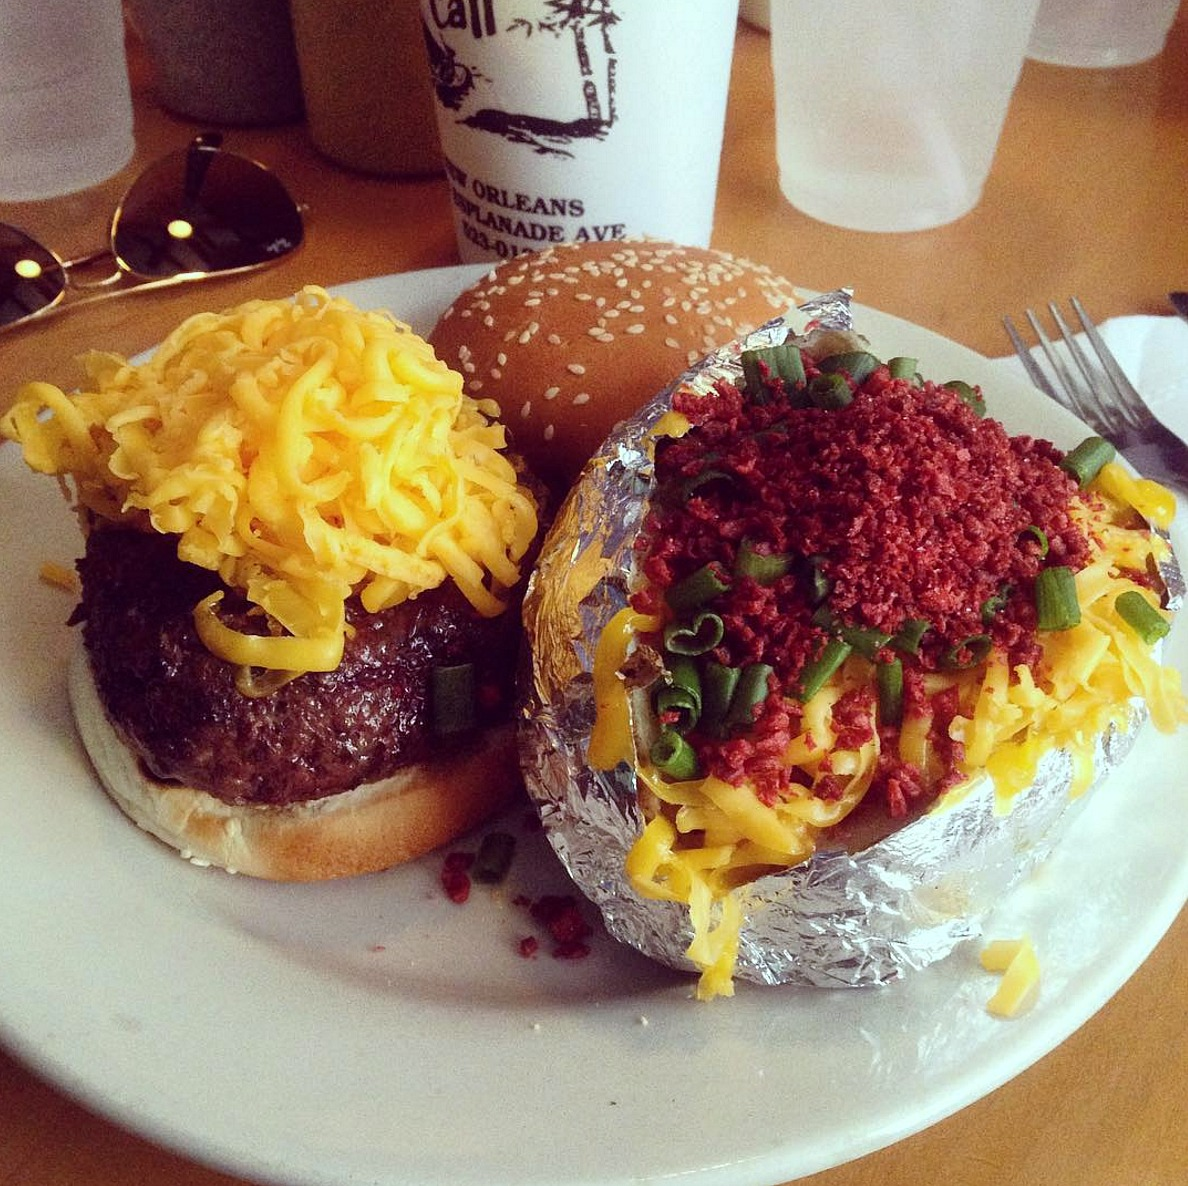 The burger from Port of Call. (Photo via Instagram user @joshmasc)